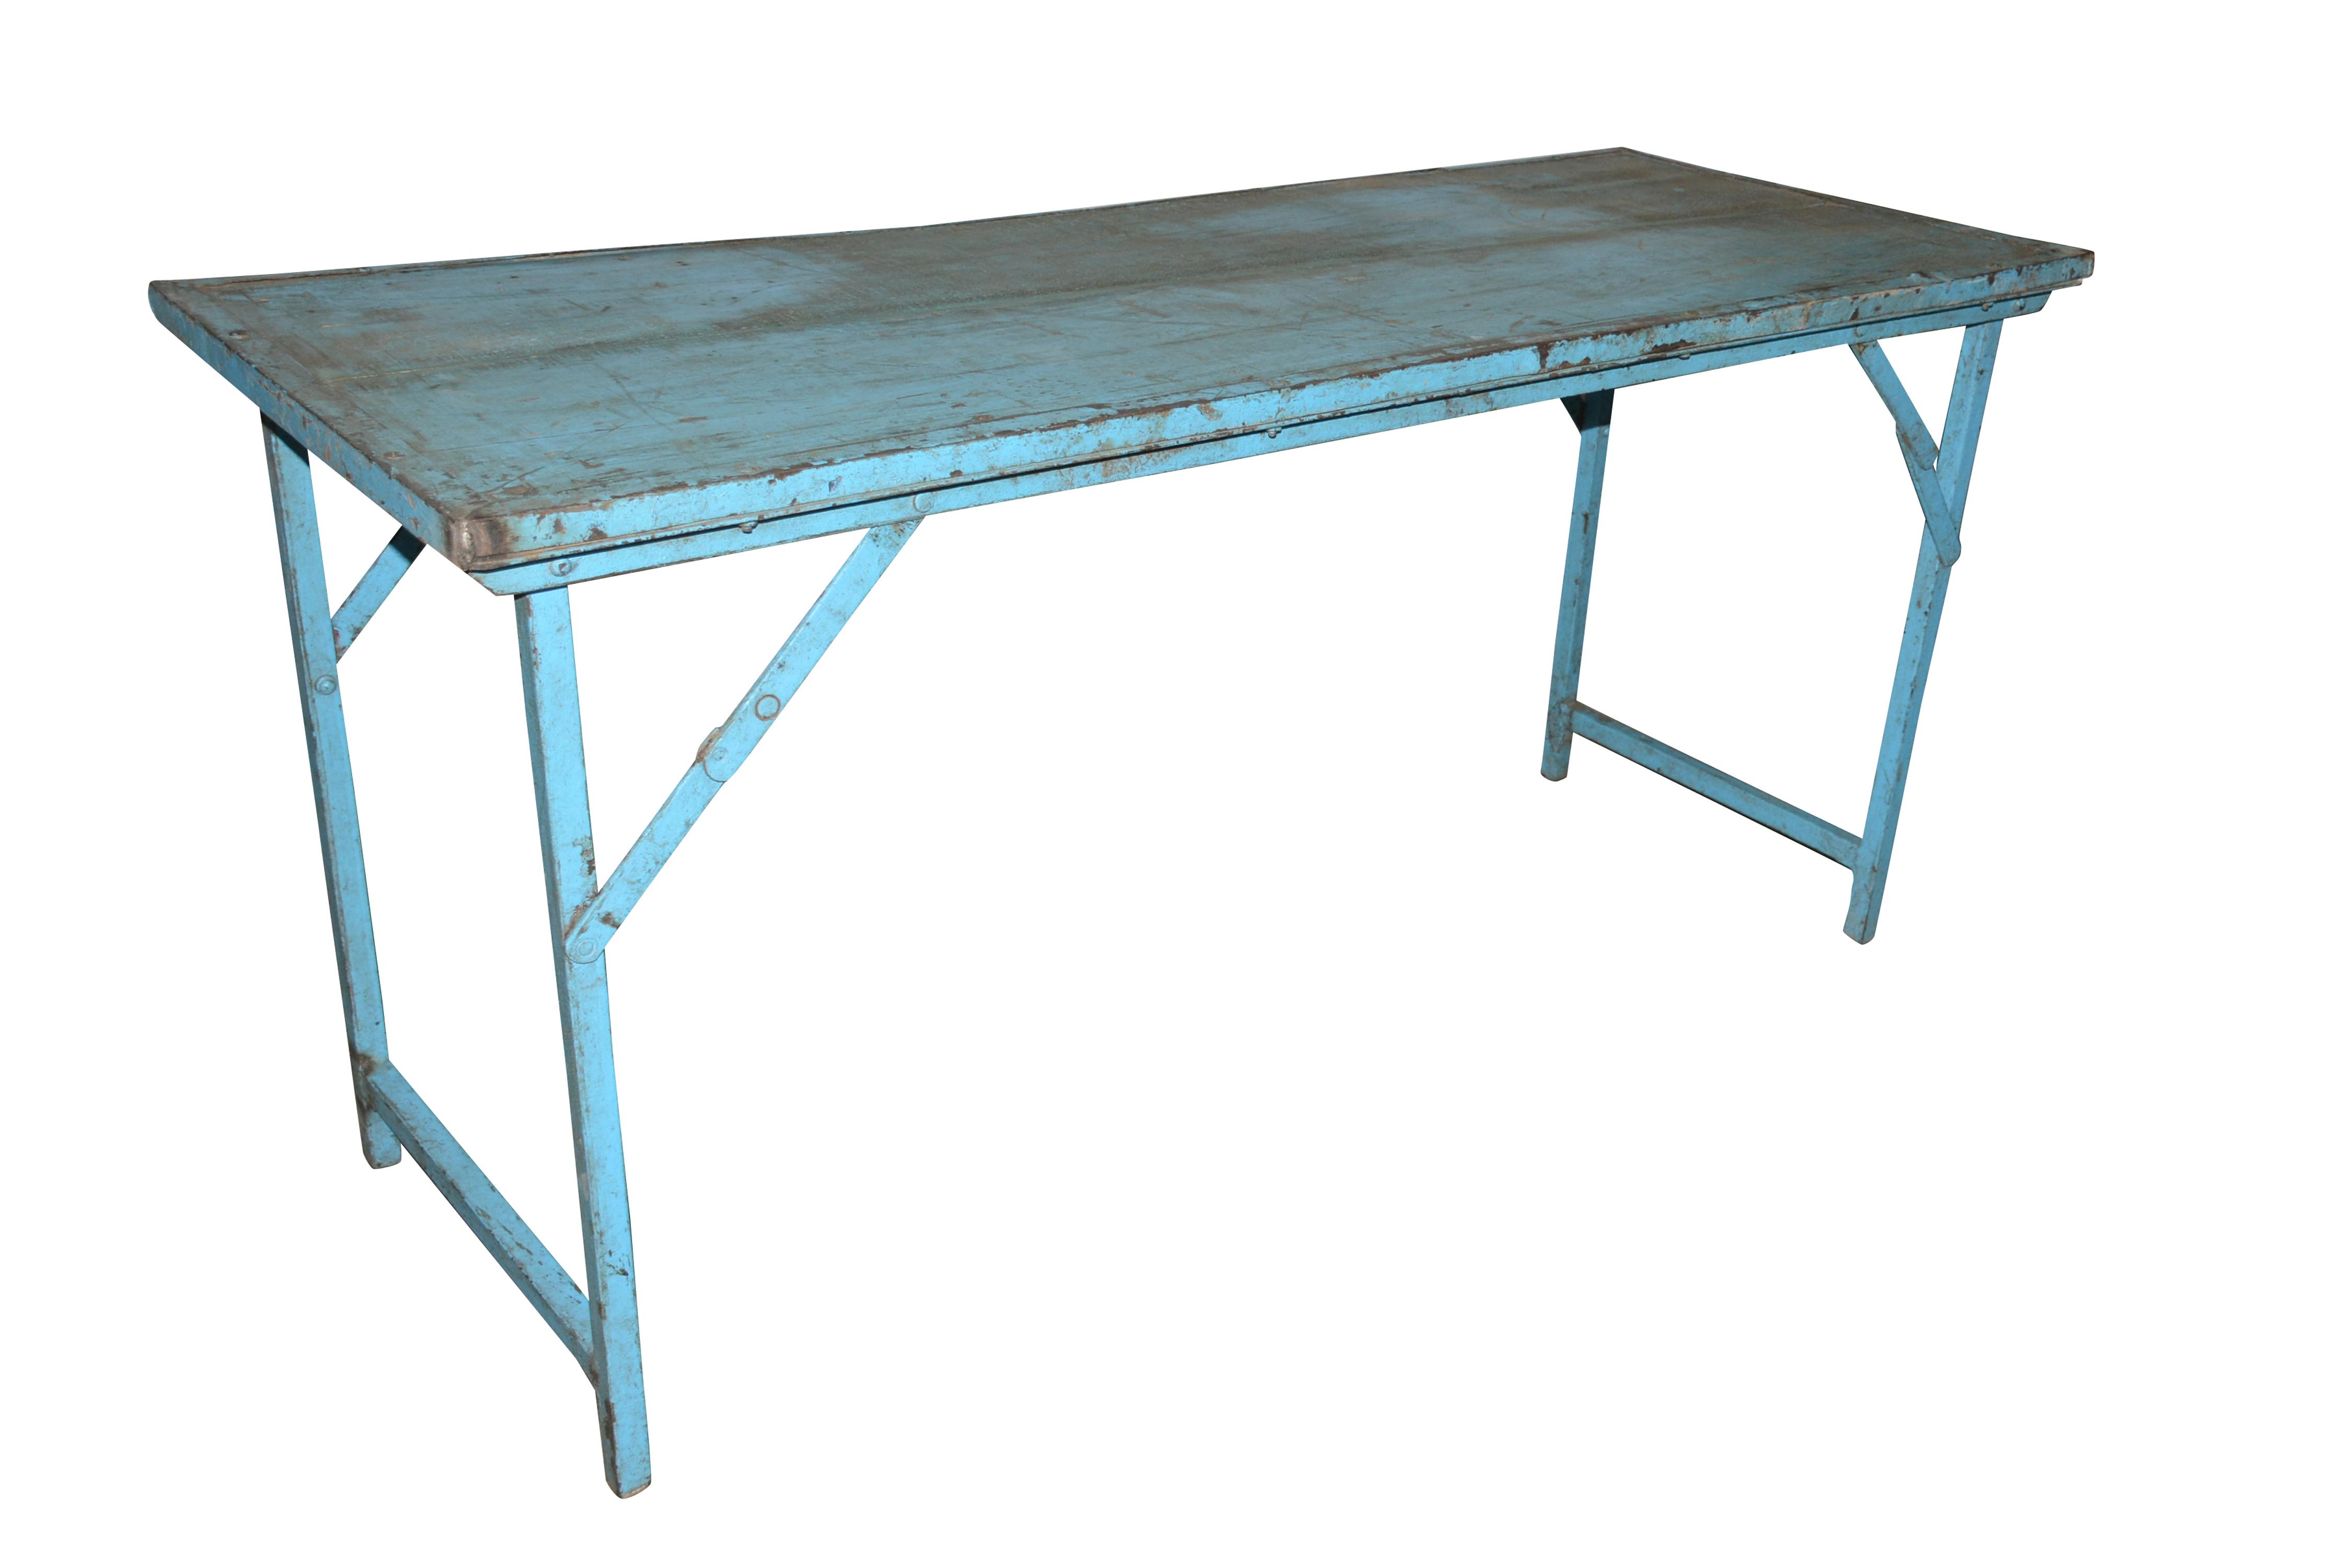 ANRA14105 BLUE - 154 x 60 x 77 cm